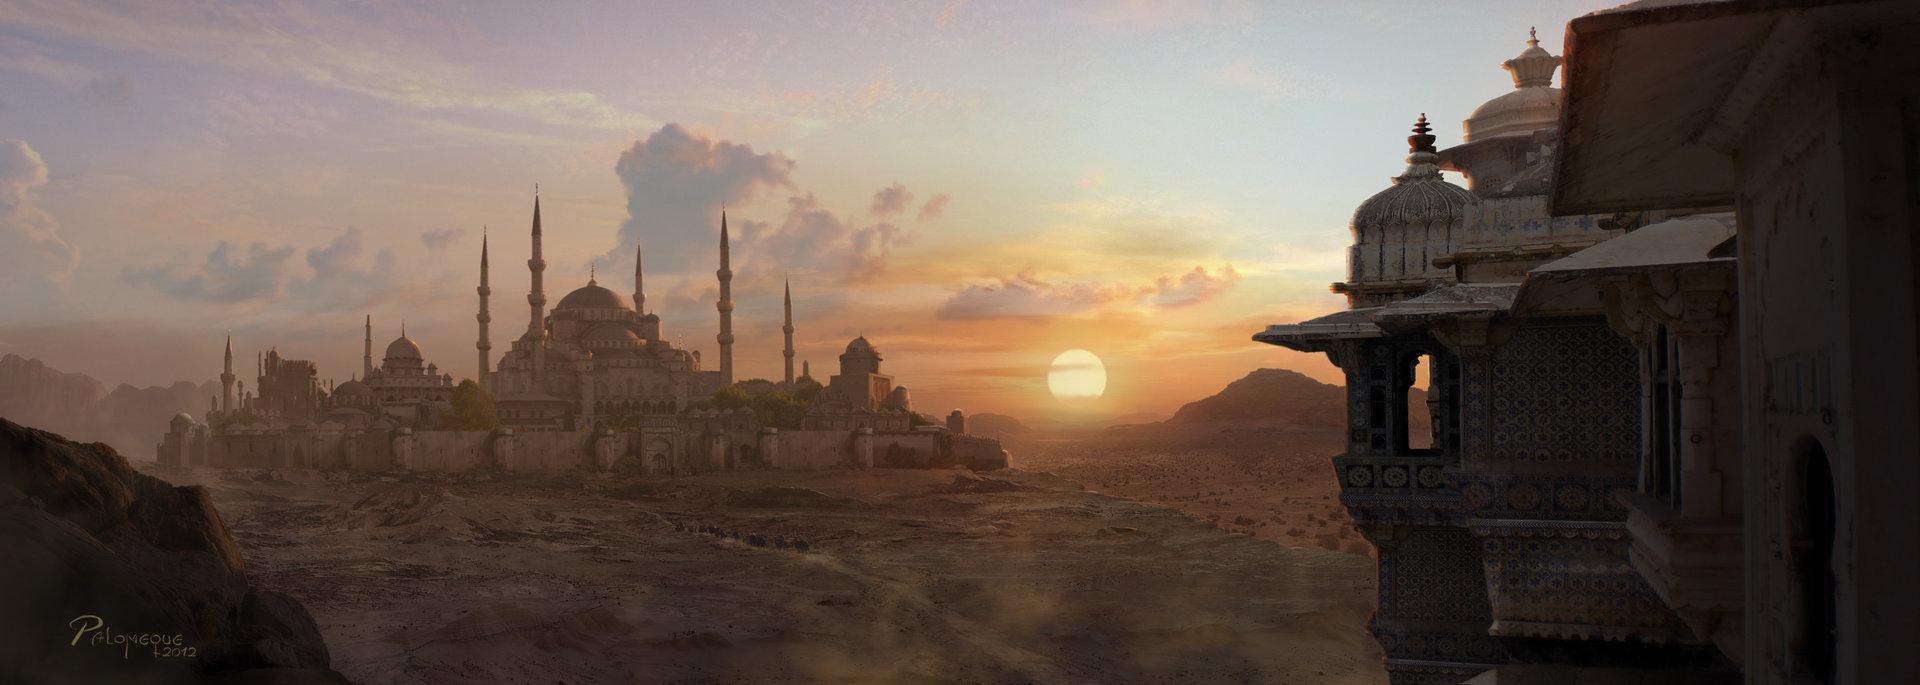 Pablo palomeque desert sunset